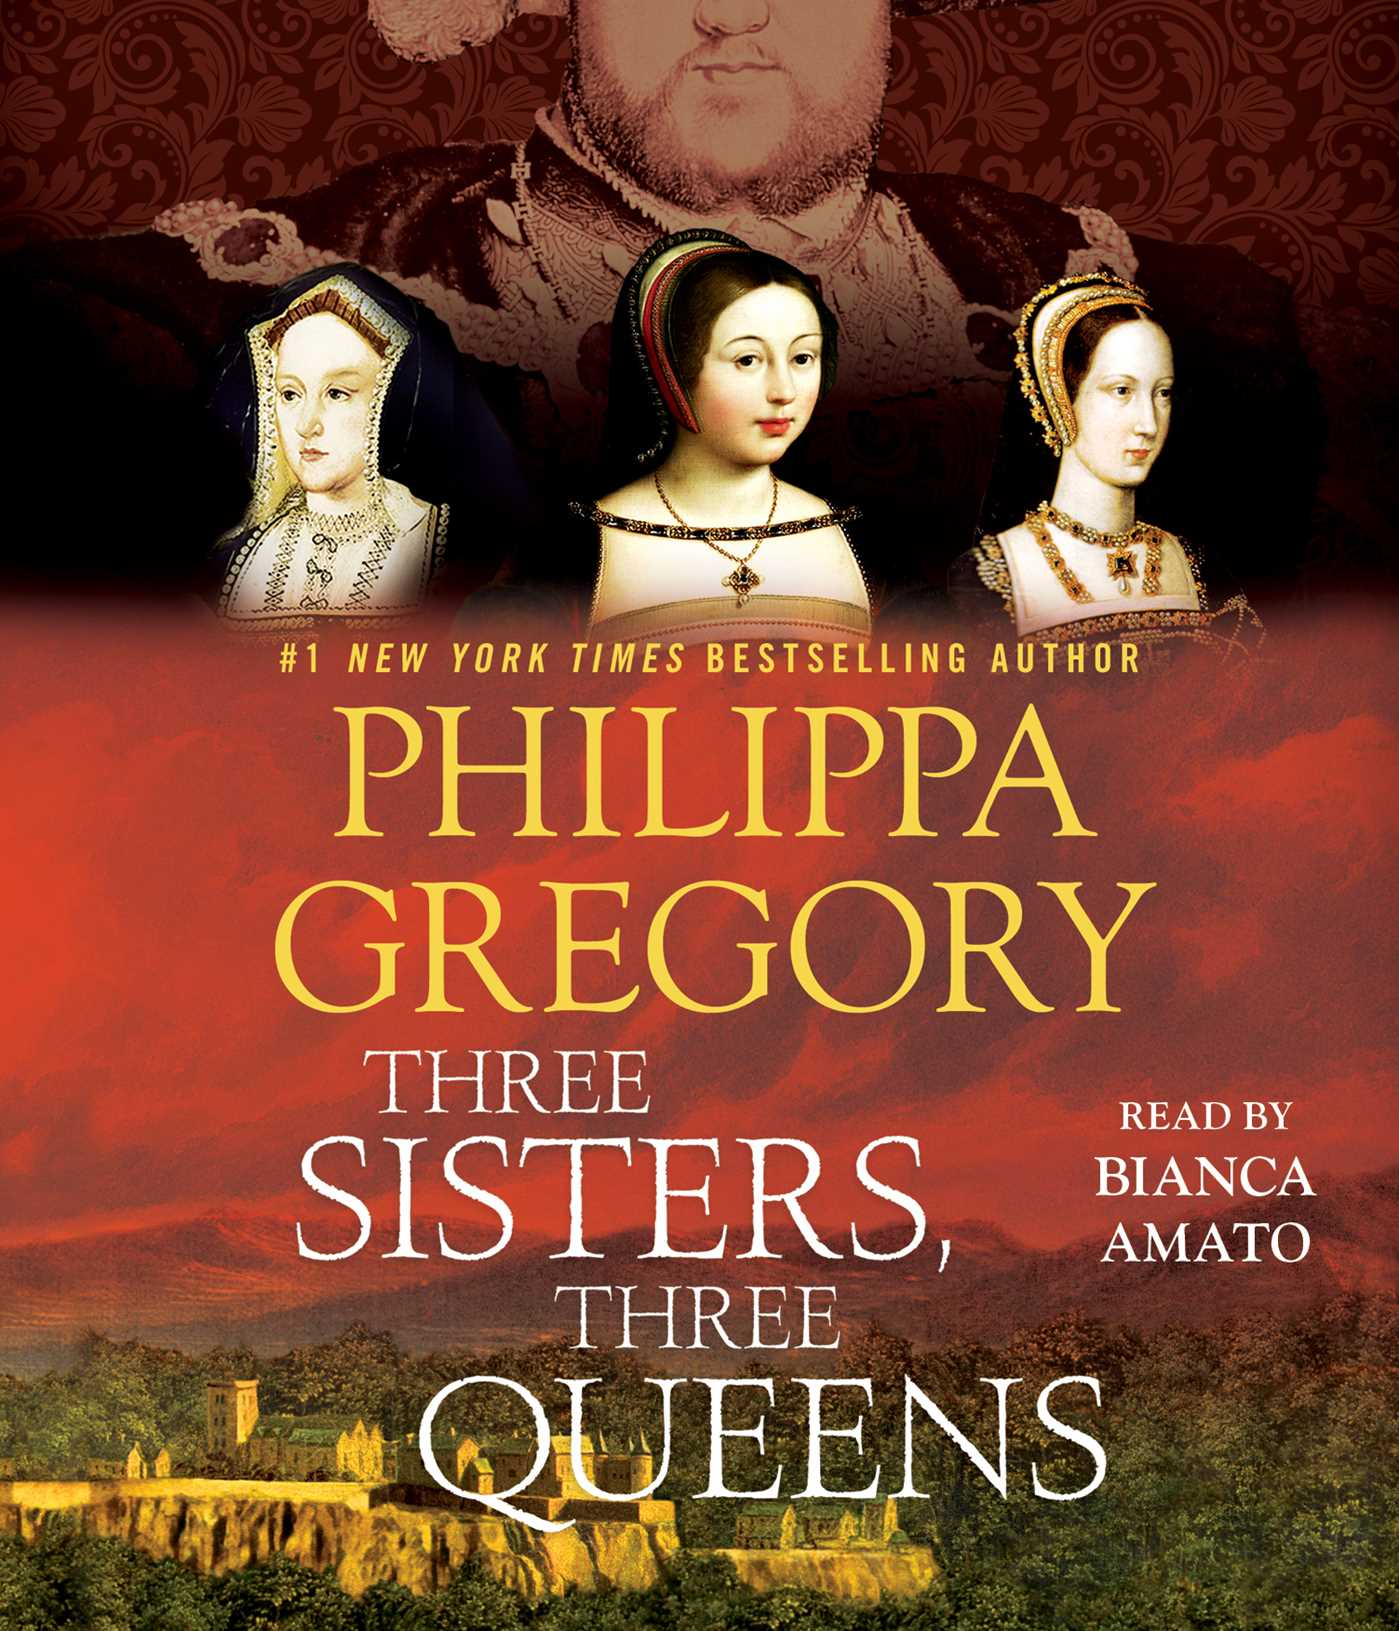 Three sisters three queens 9781508211563 hr